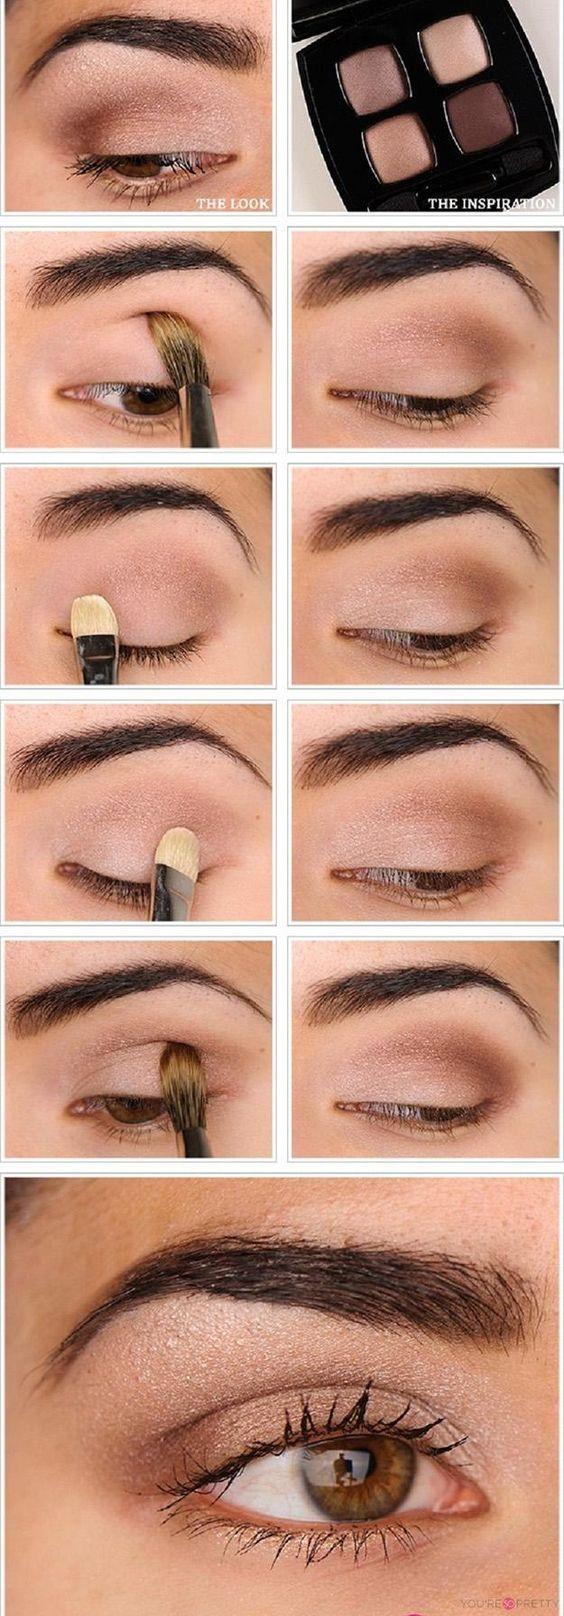 natural-eye-makeup via